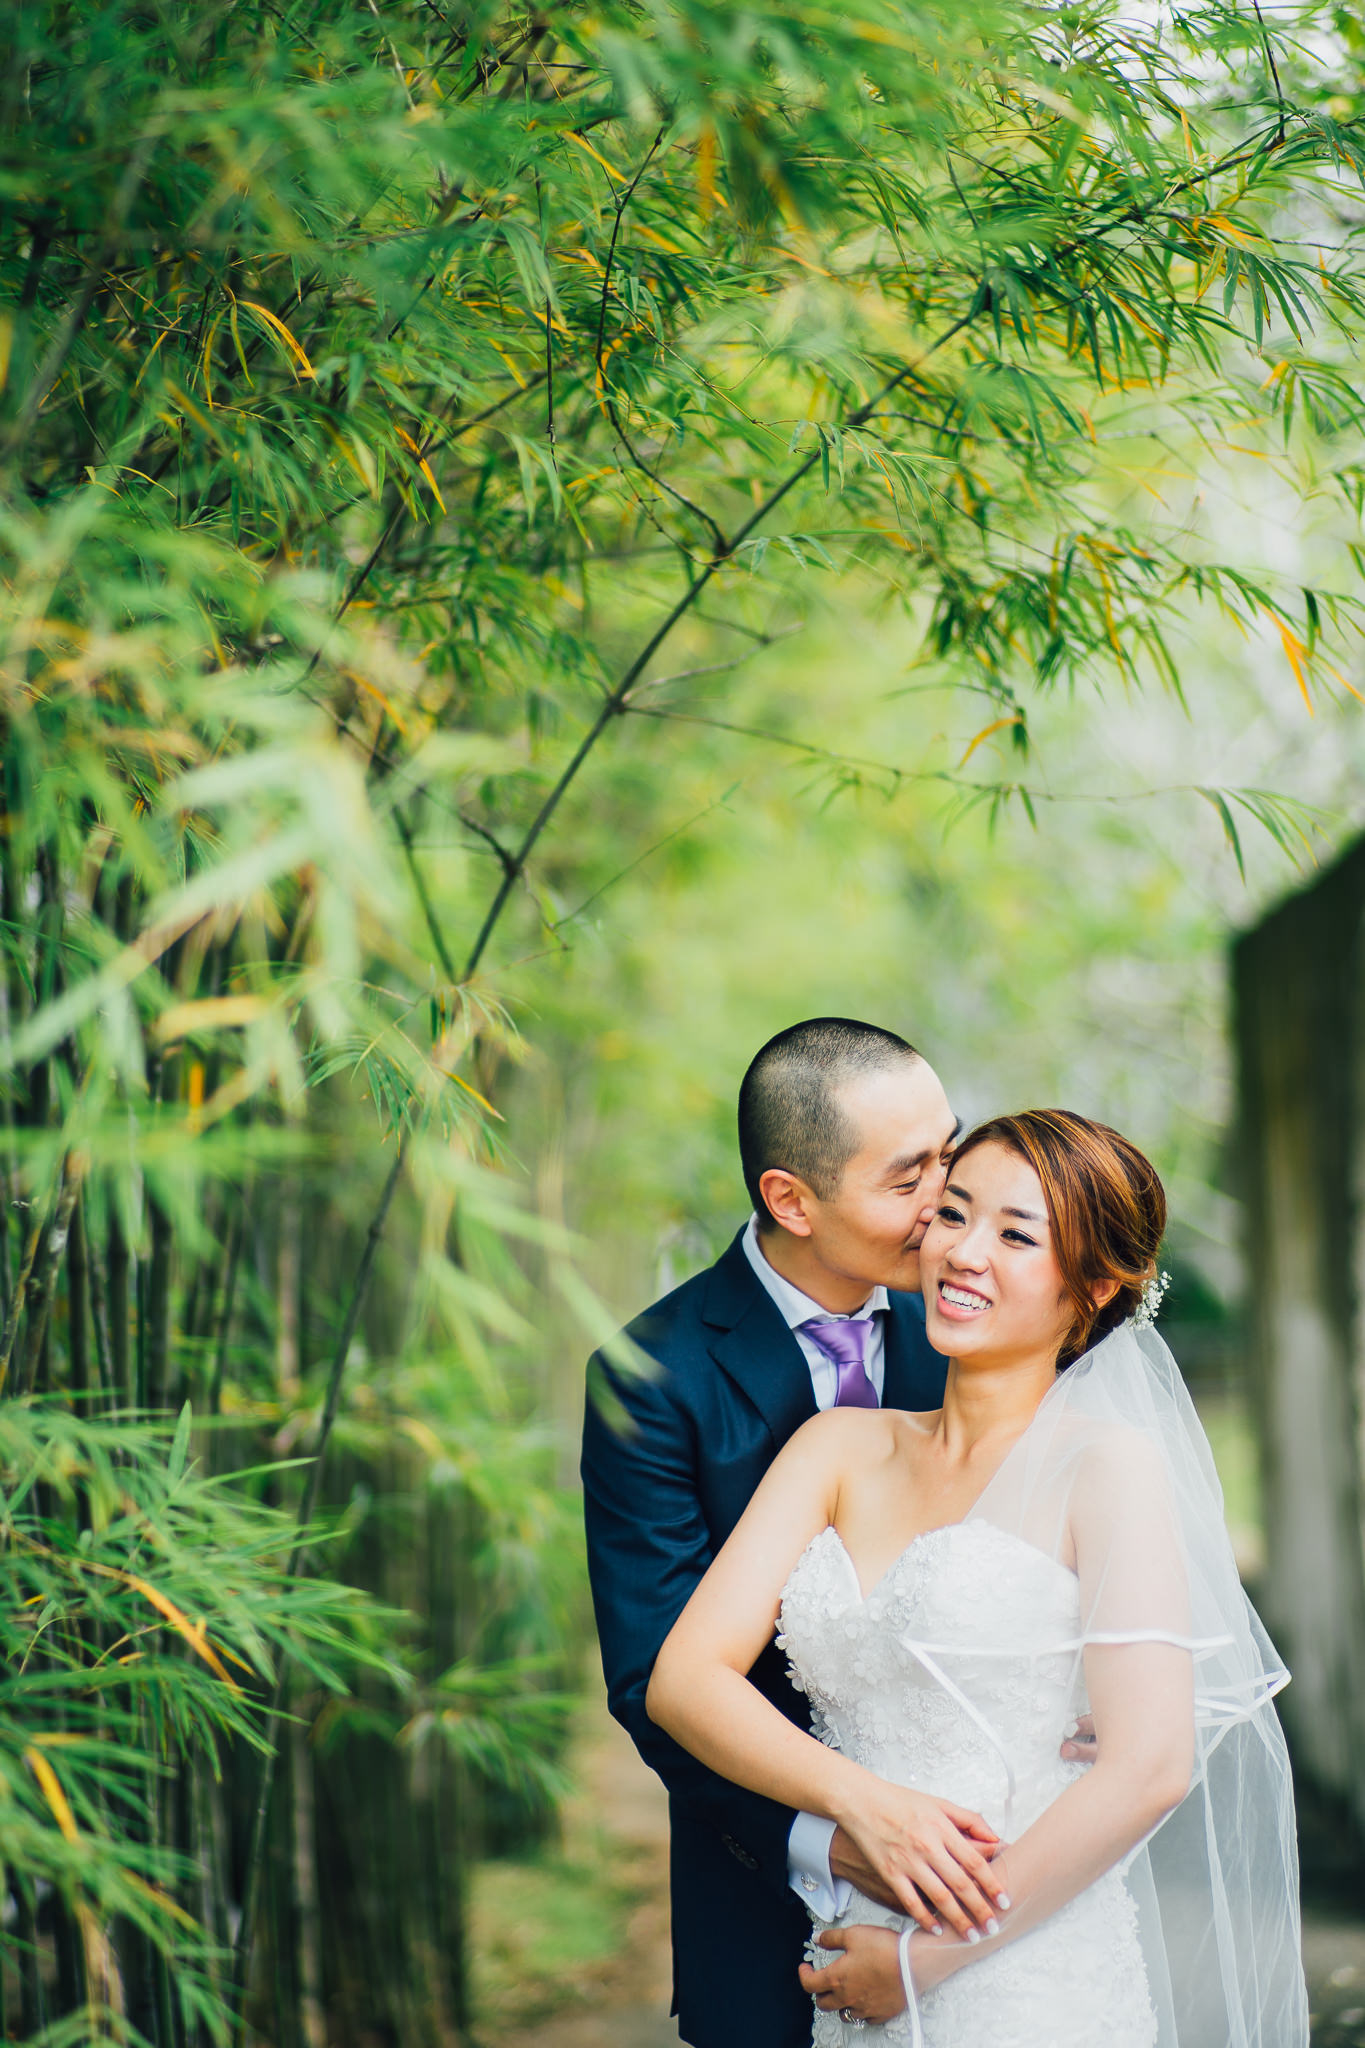 Singapore Wedding Photographer Garden asia shamrock chapel actual day wedding coverage (102 of 110).JPG